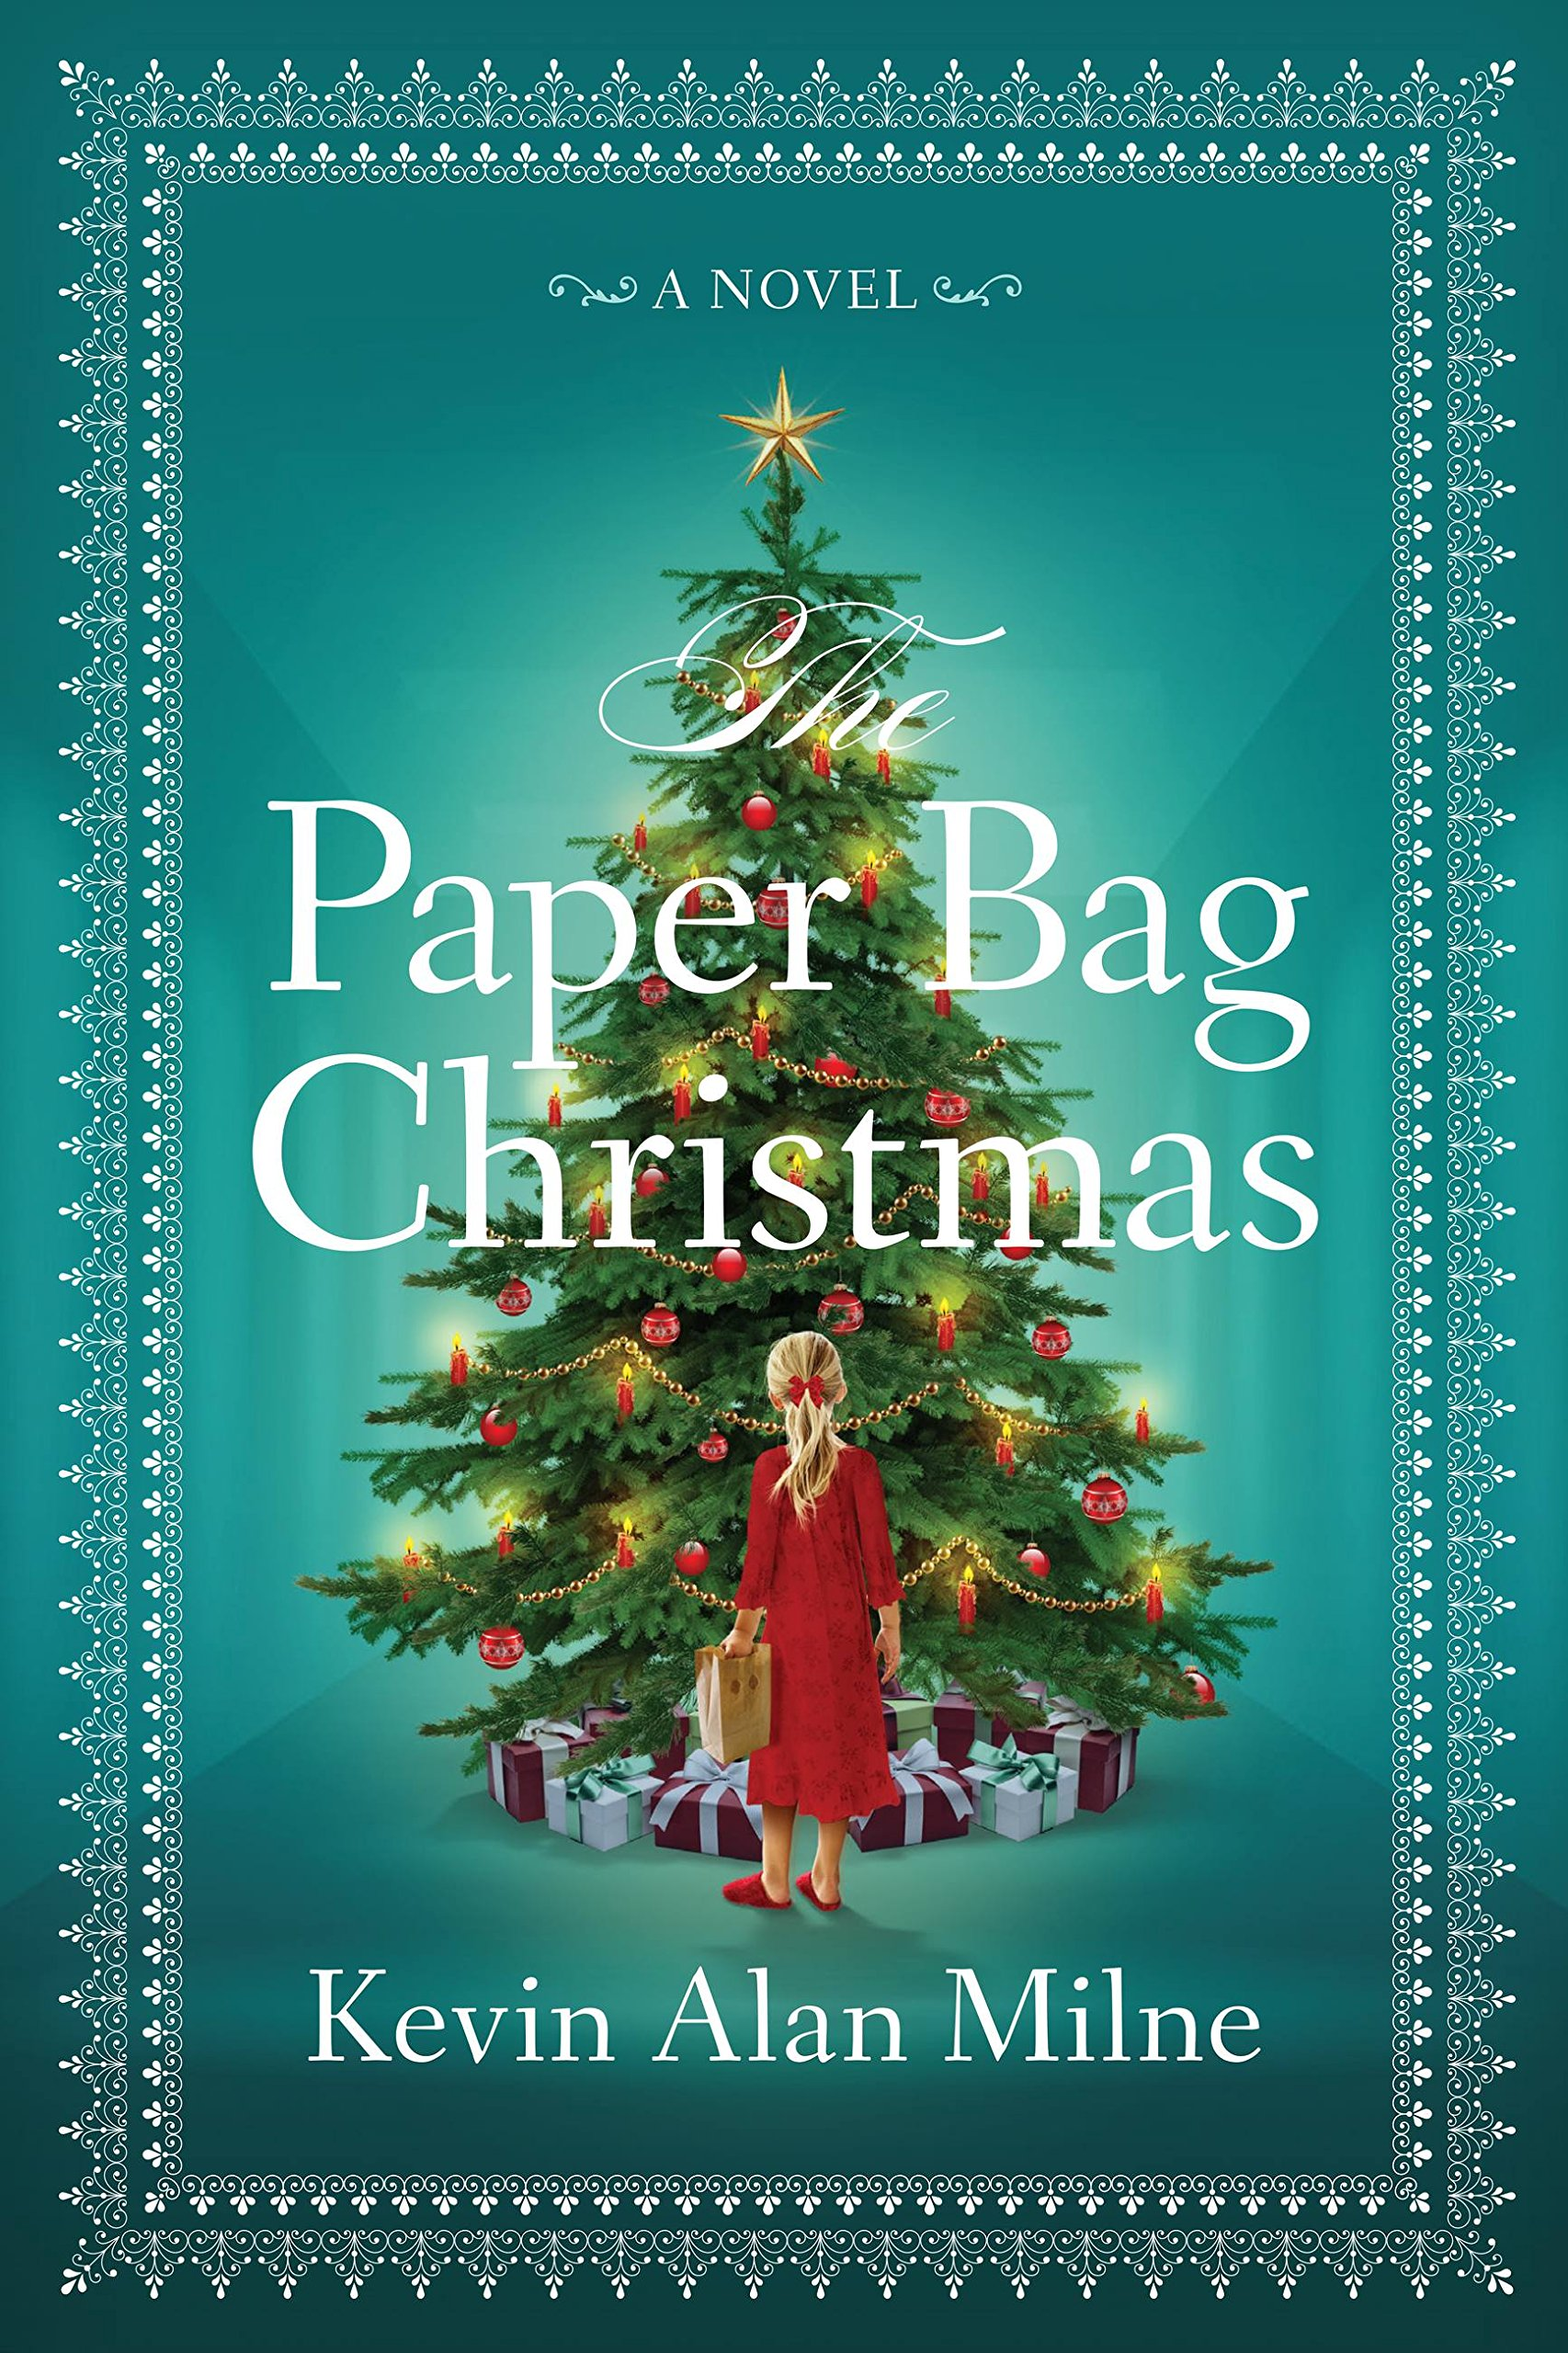 The Paper Bag Christmas: Kevin Alan Milne: 9781599950730: Amazon.com ...